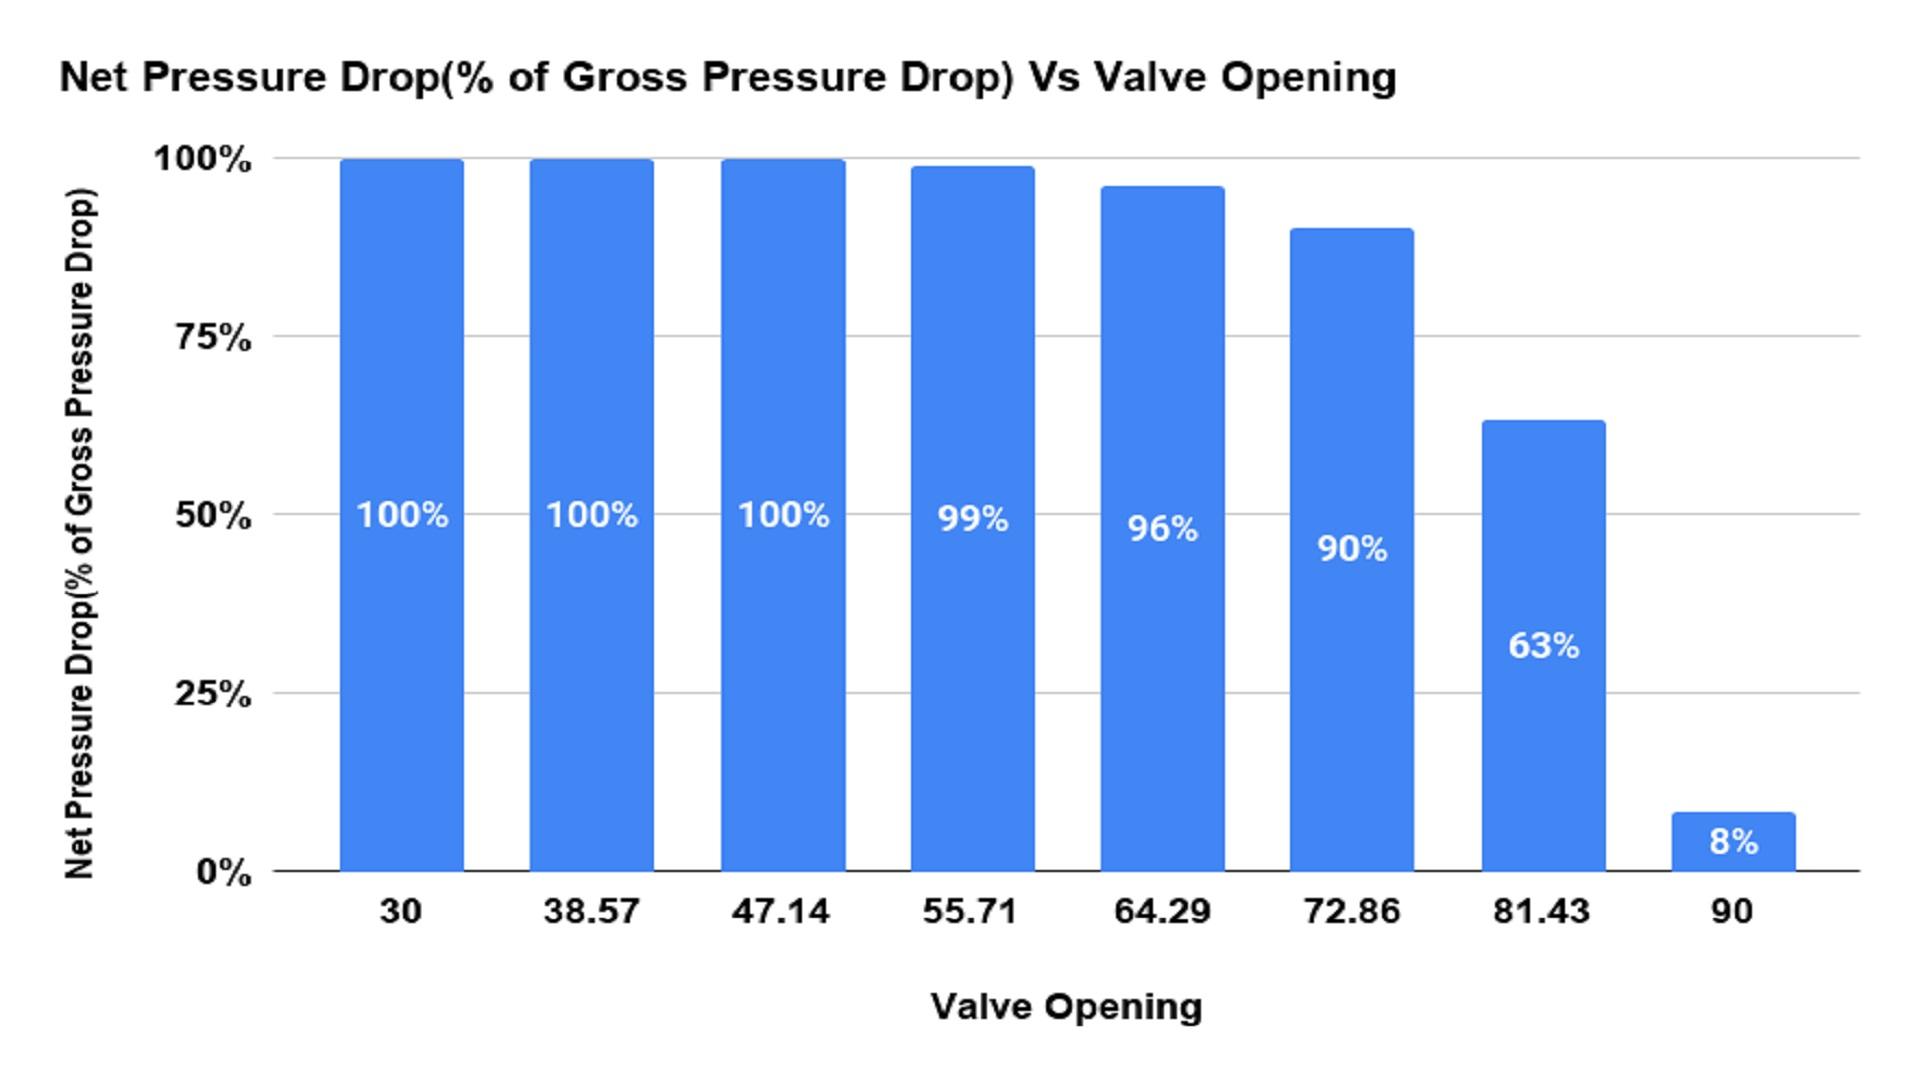 Net Pressure Drop